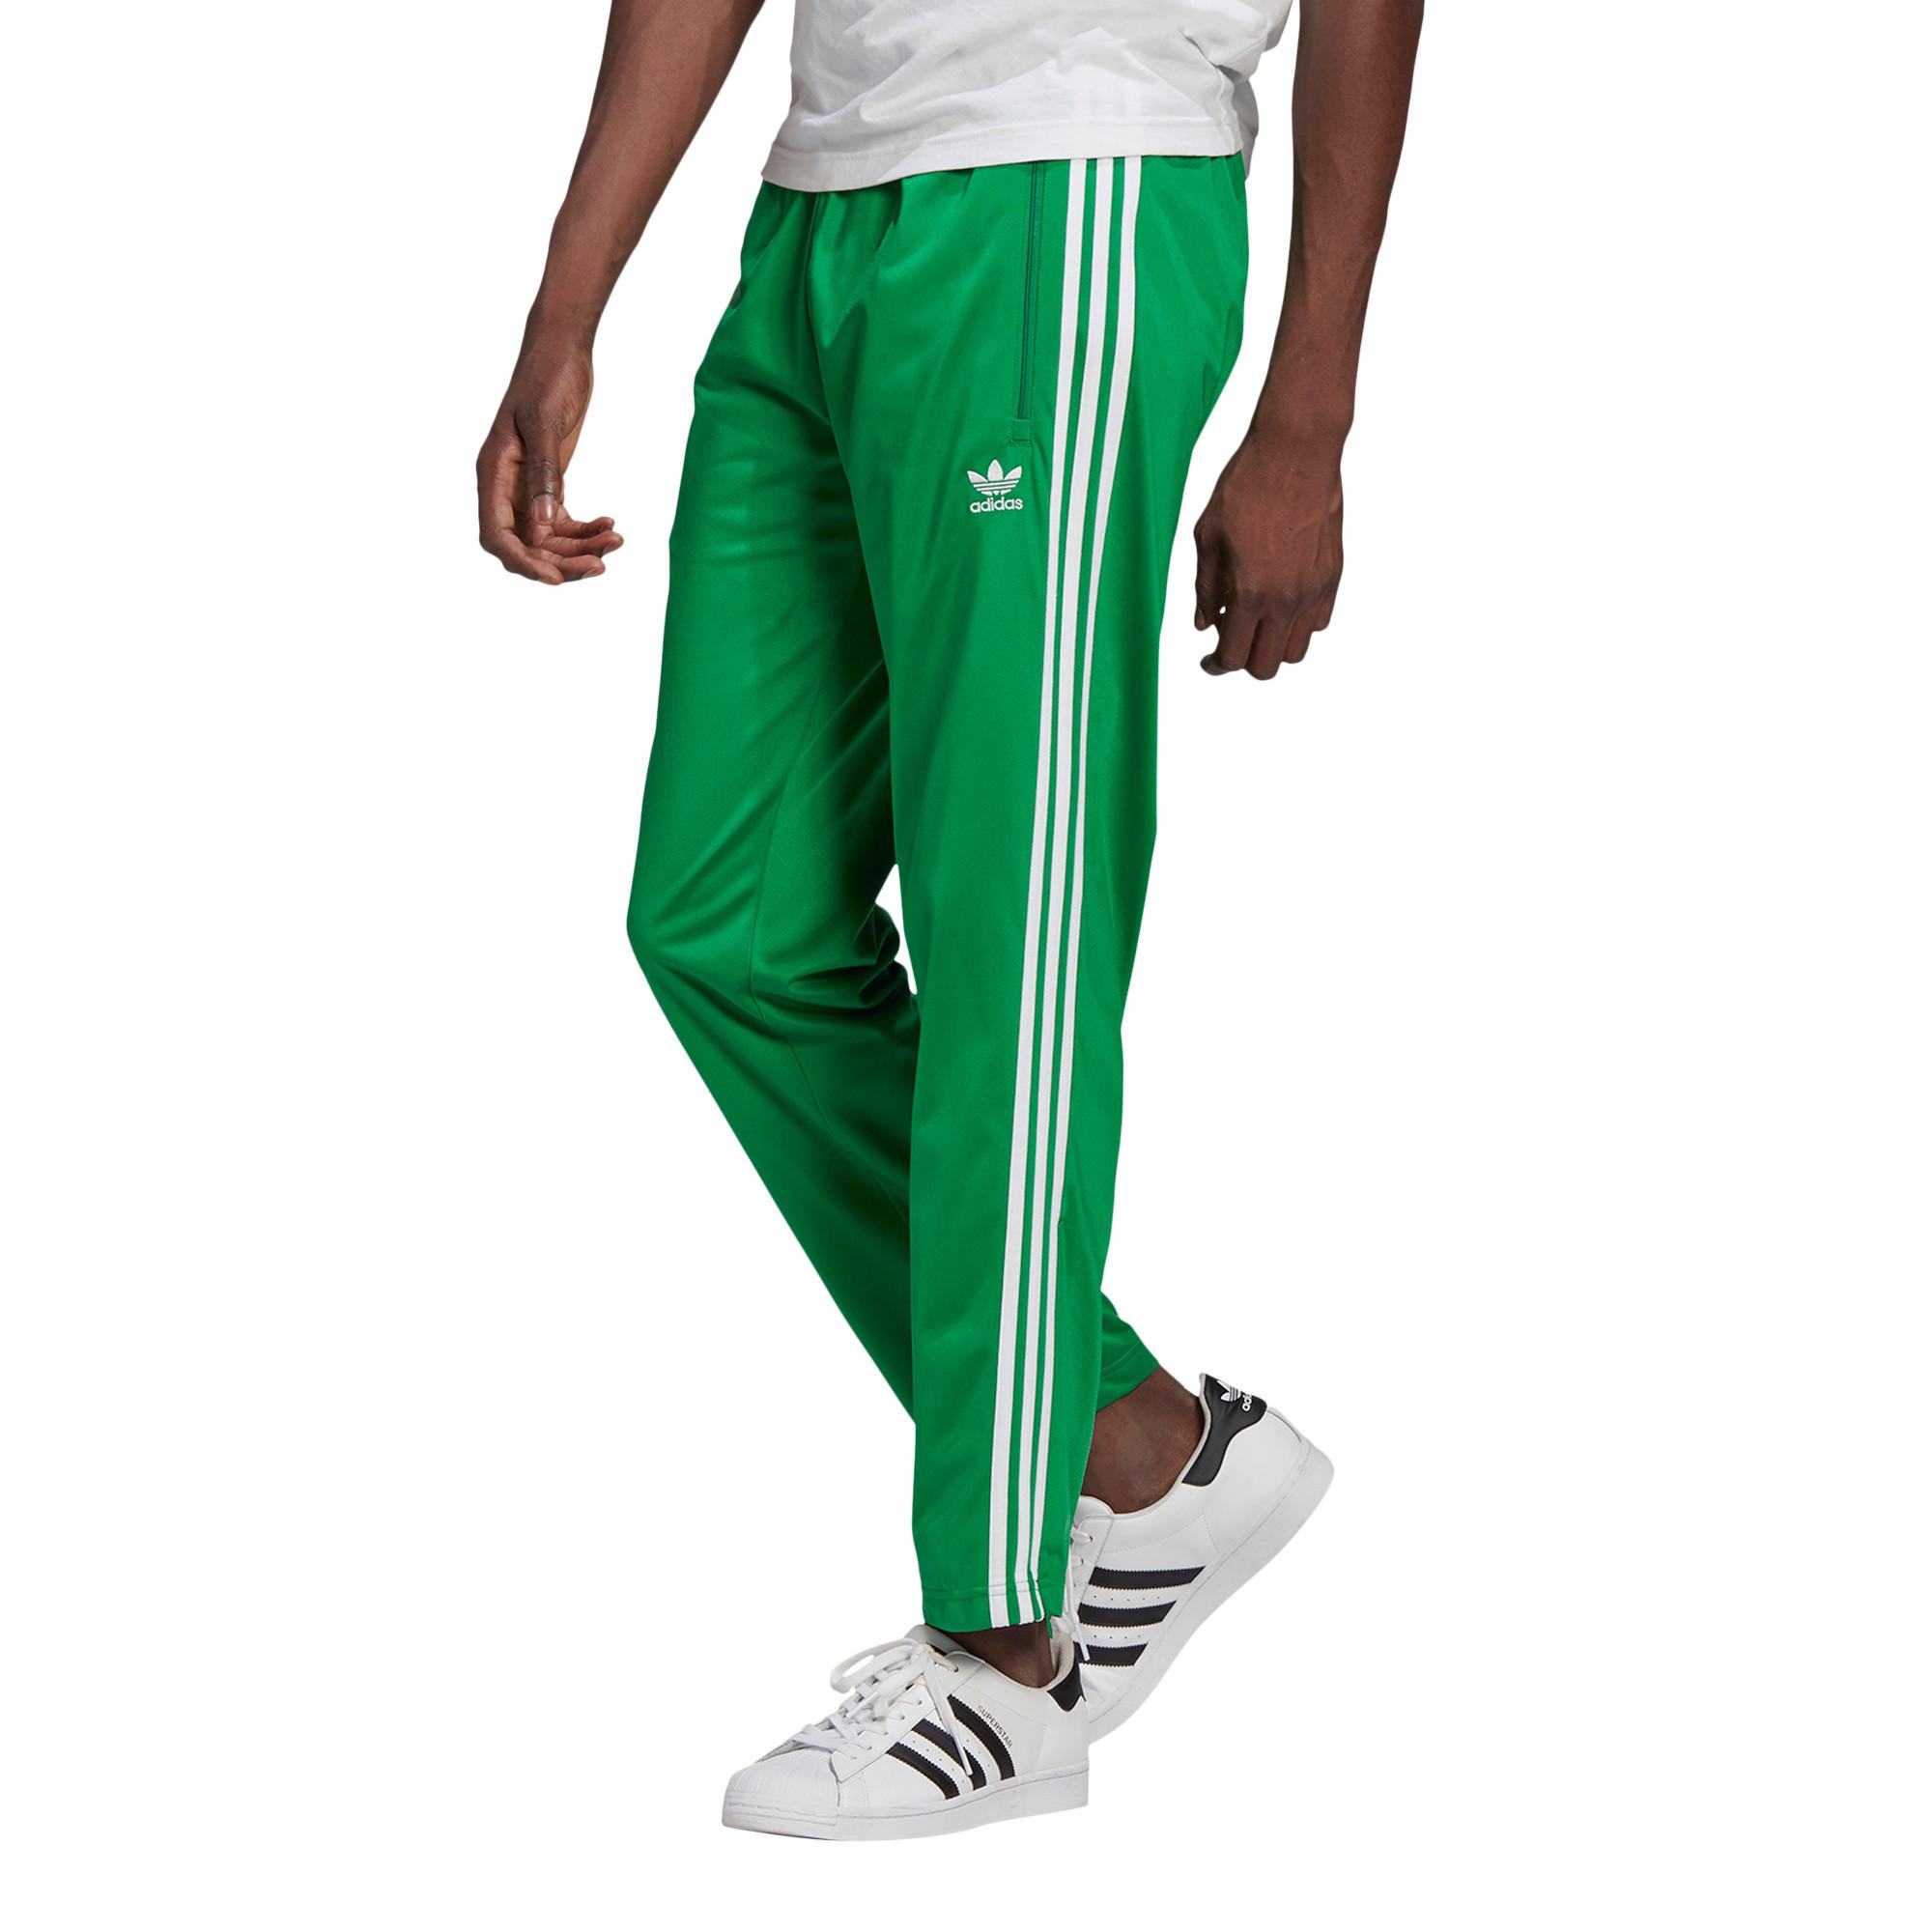 Pantaloni tuta adicolor classics, Verde, large image number 3